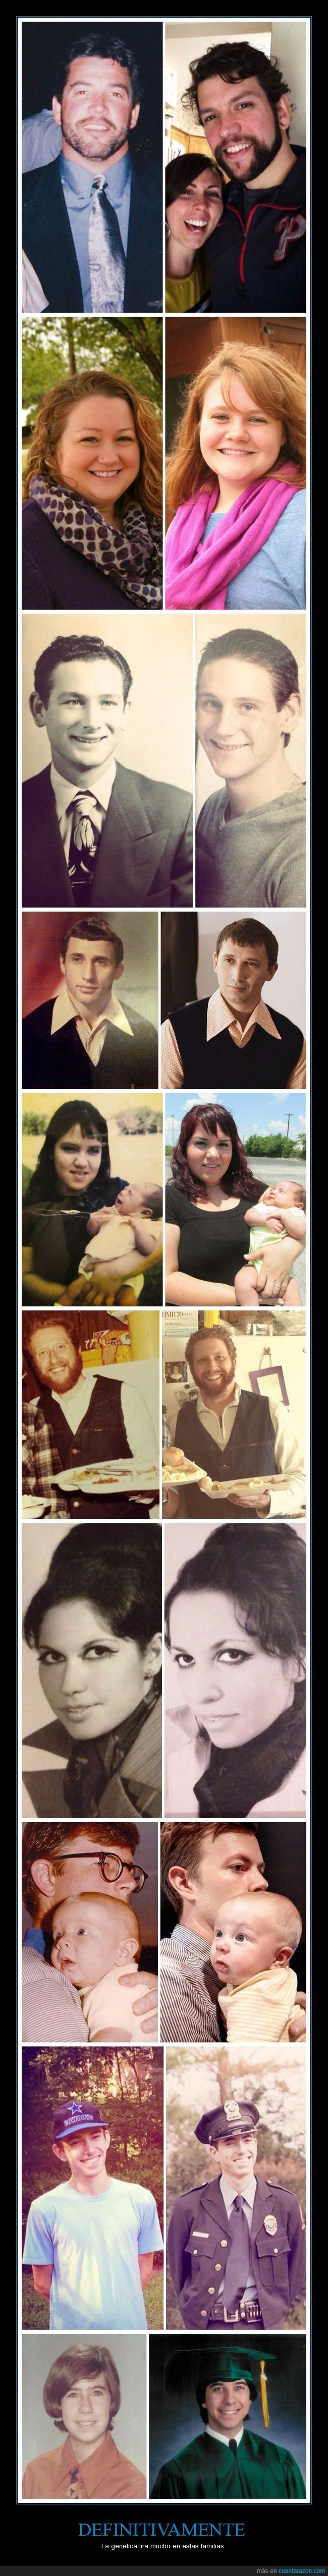 abuela,abuelo,genetica,hija,hijo,madre,padre,parecido